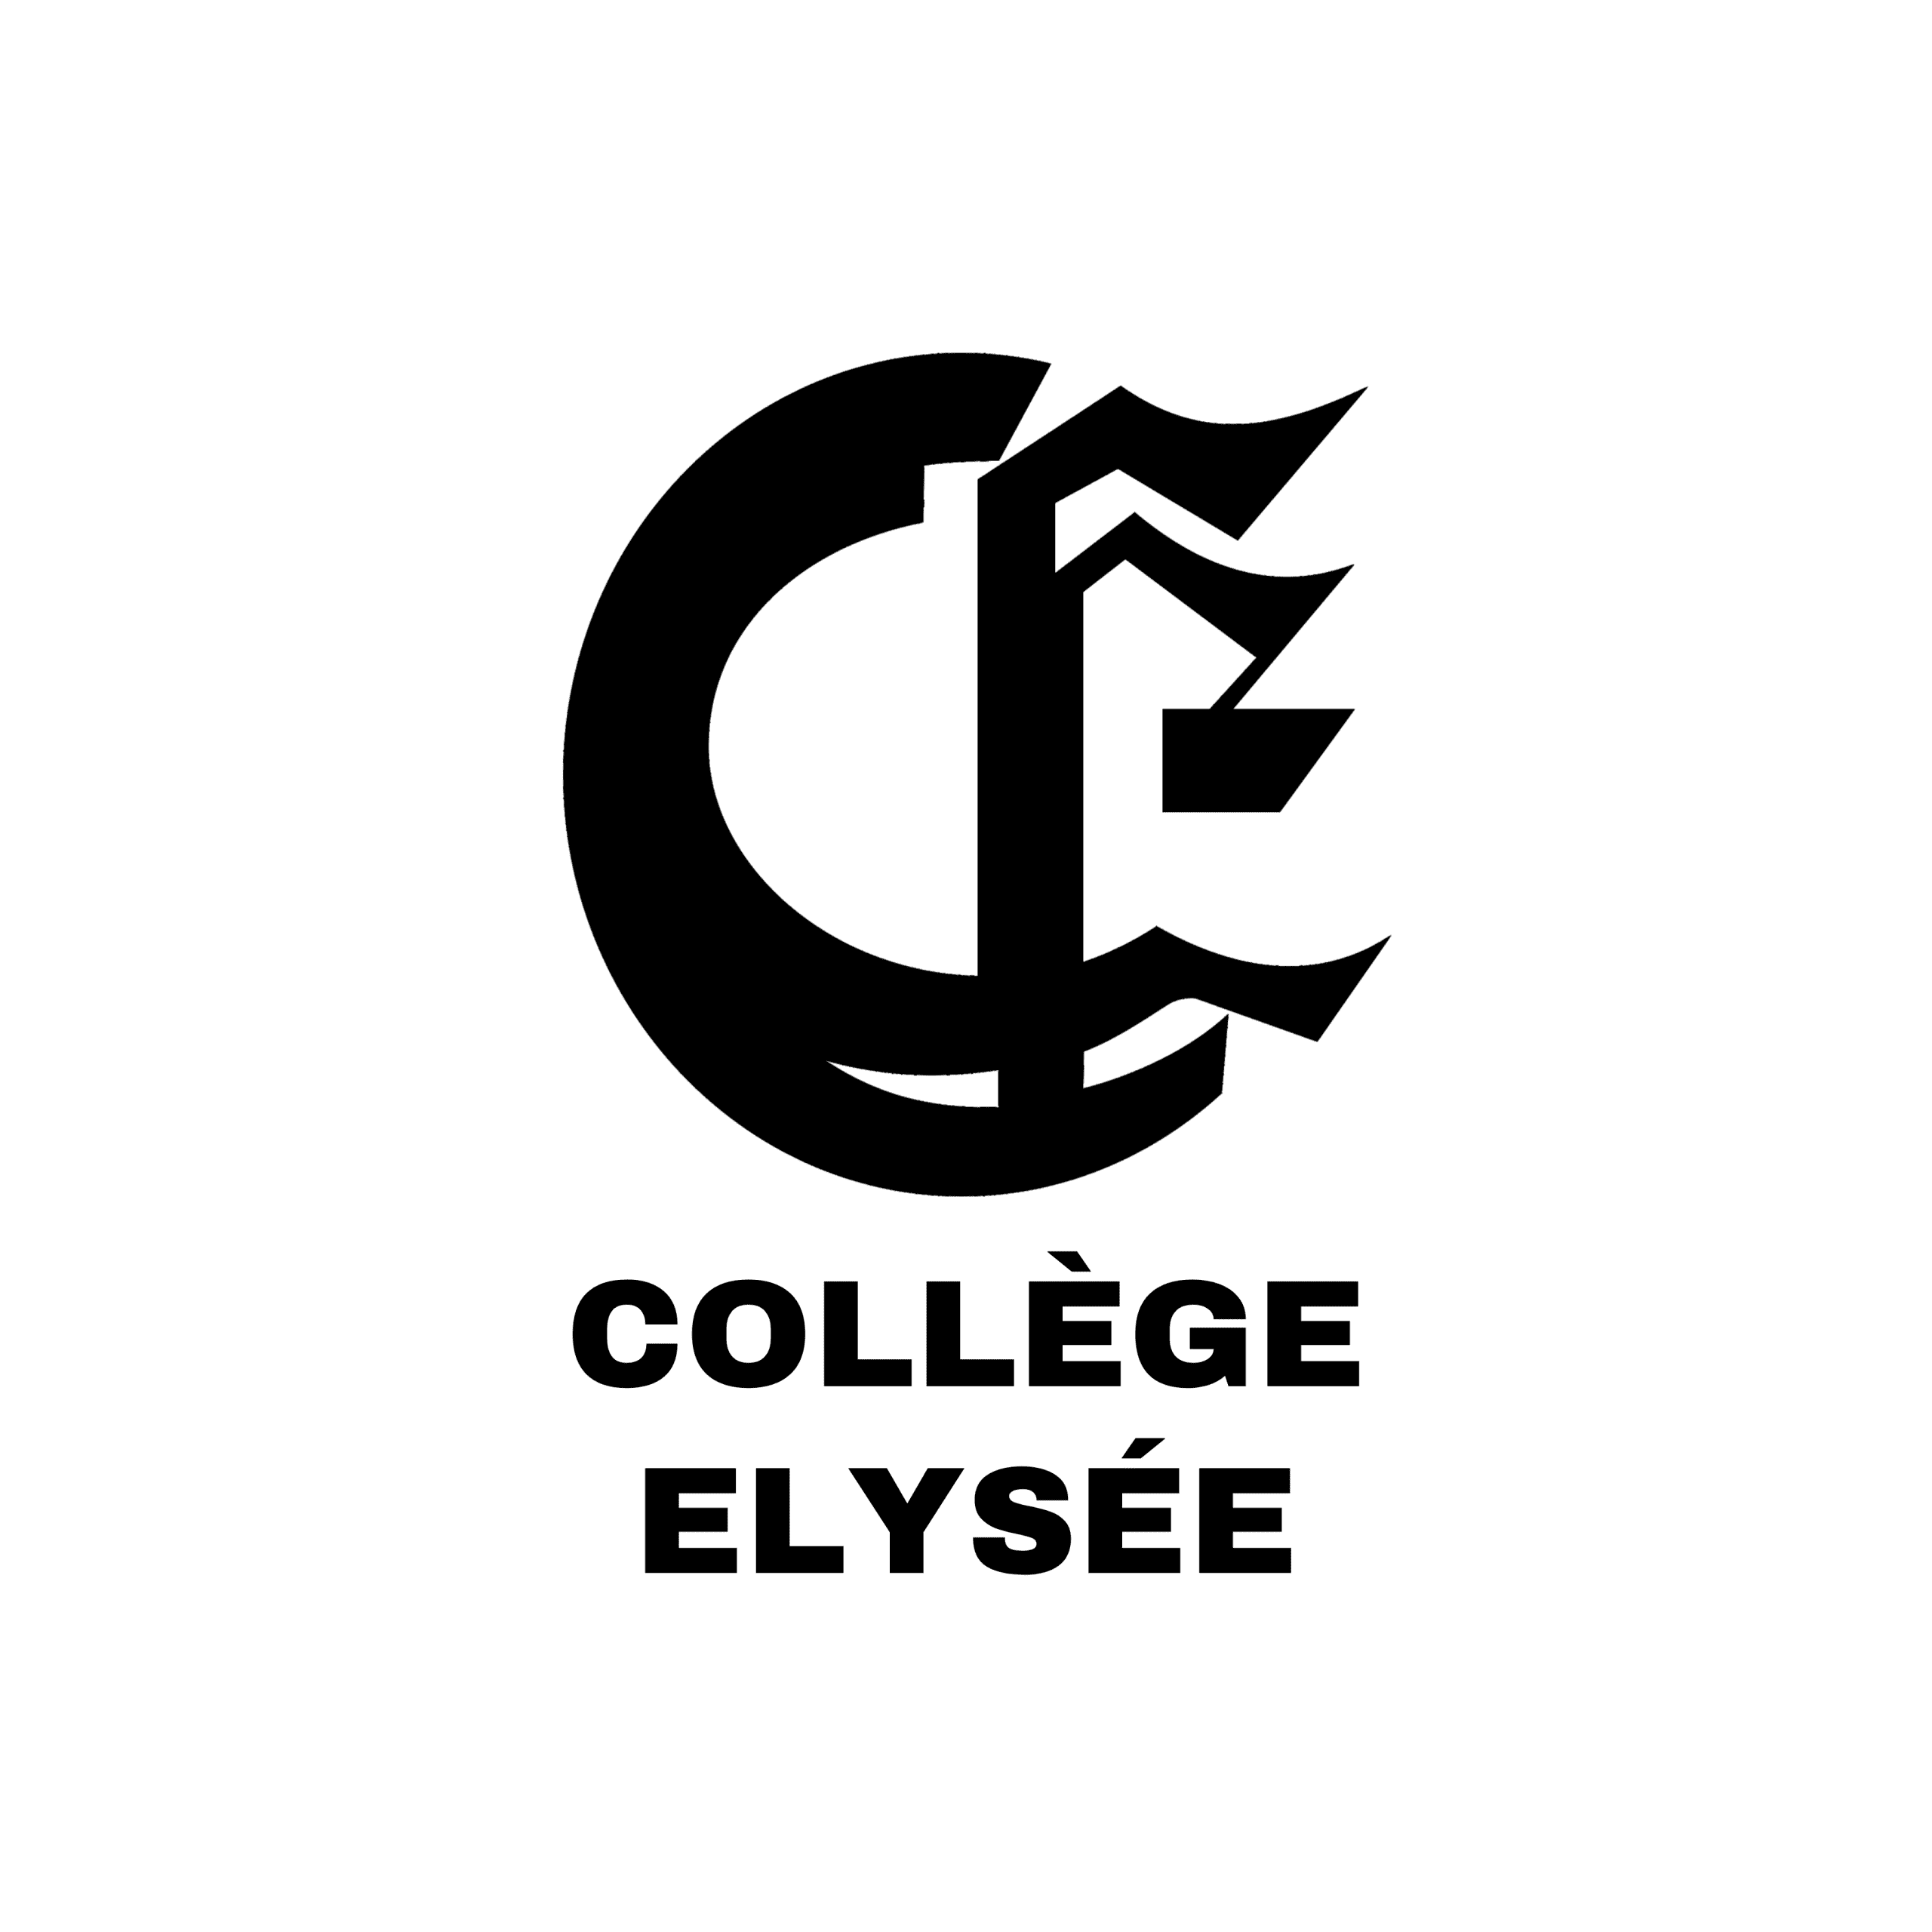 Collège Elysée